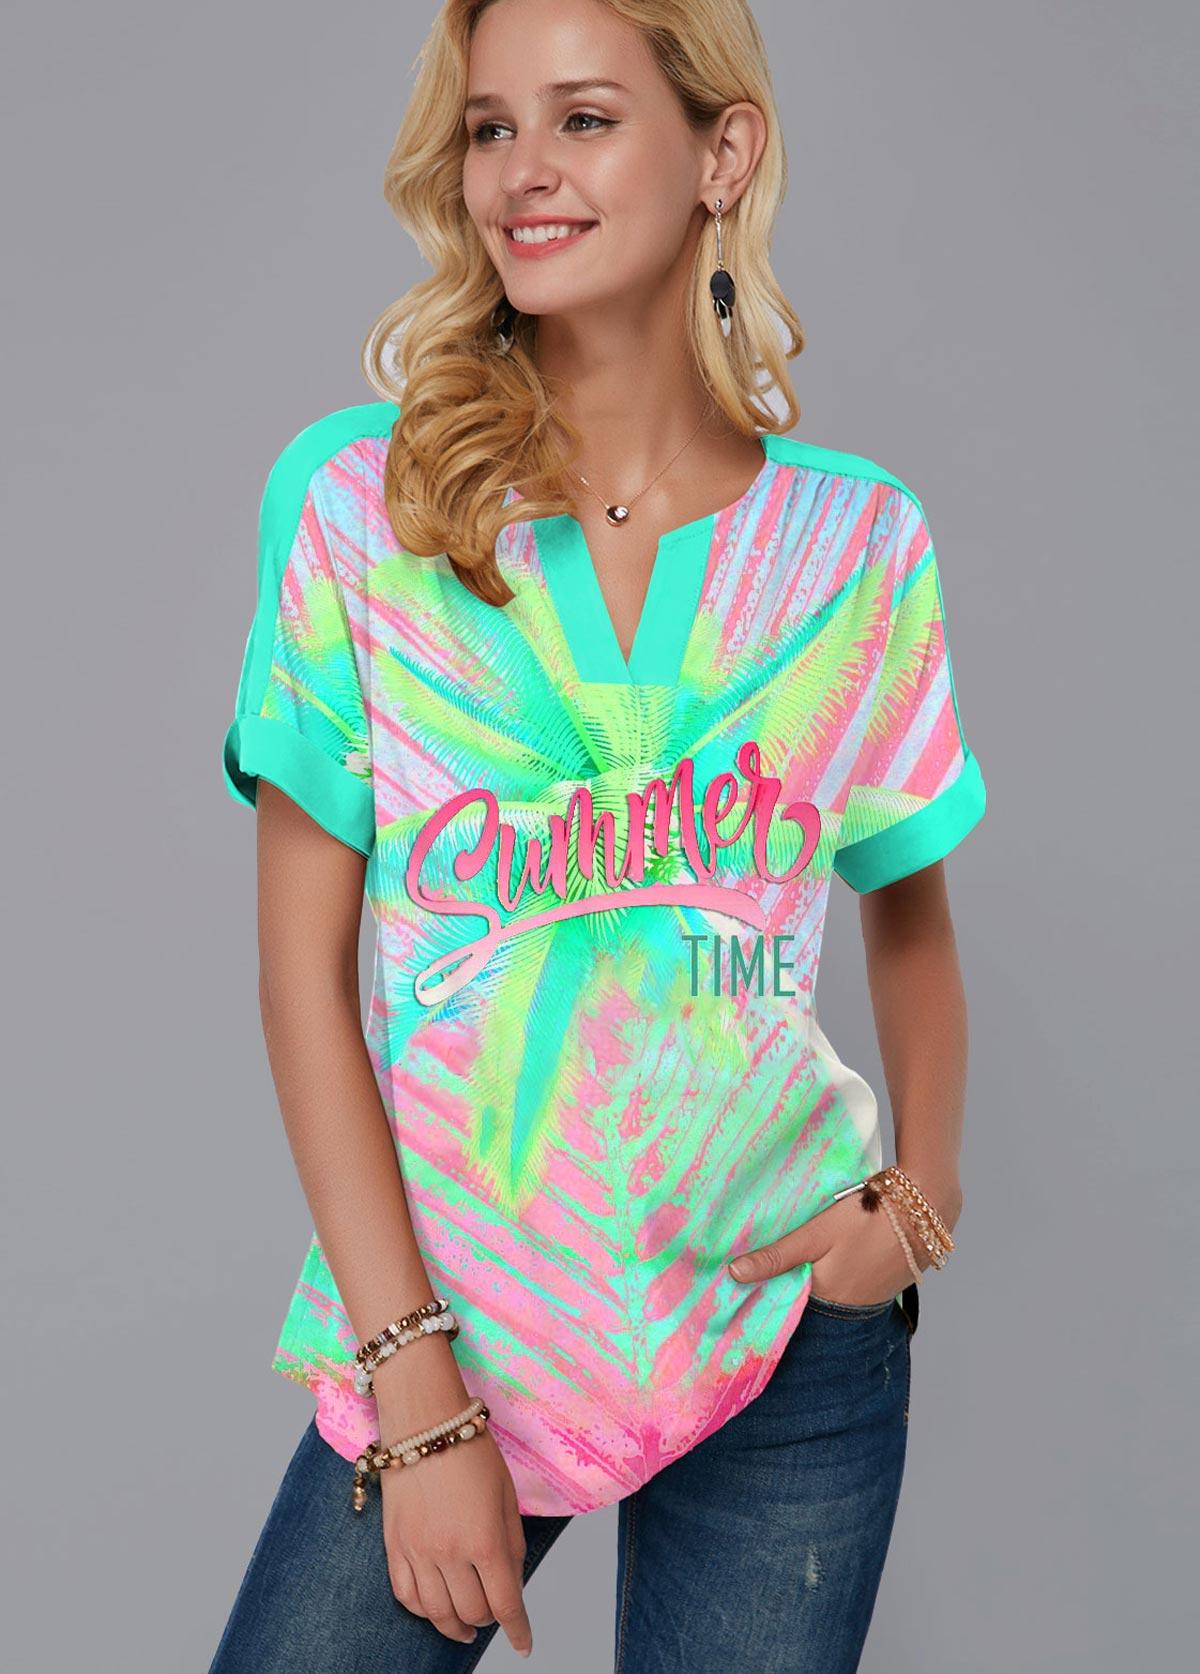 ROTITA Printed Short Sleeve Rainbow Color T Shirt